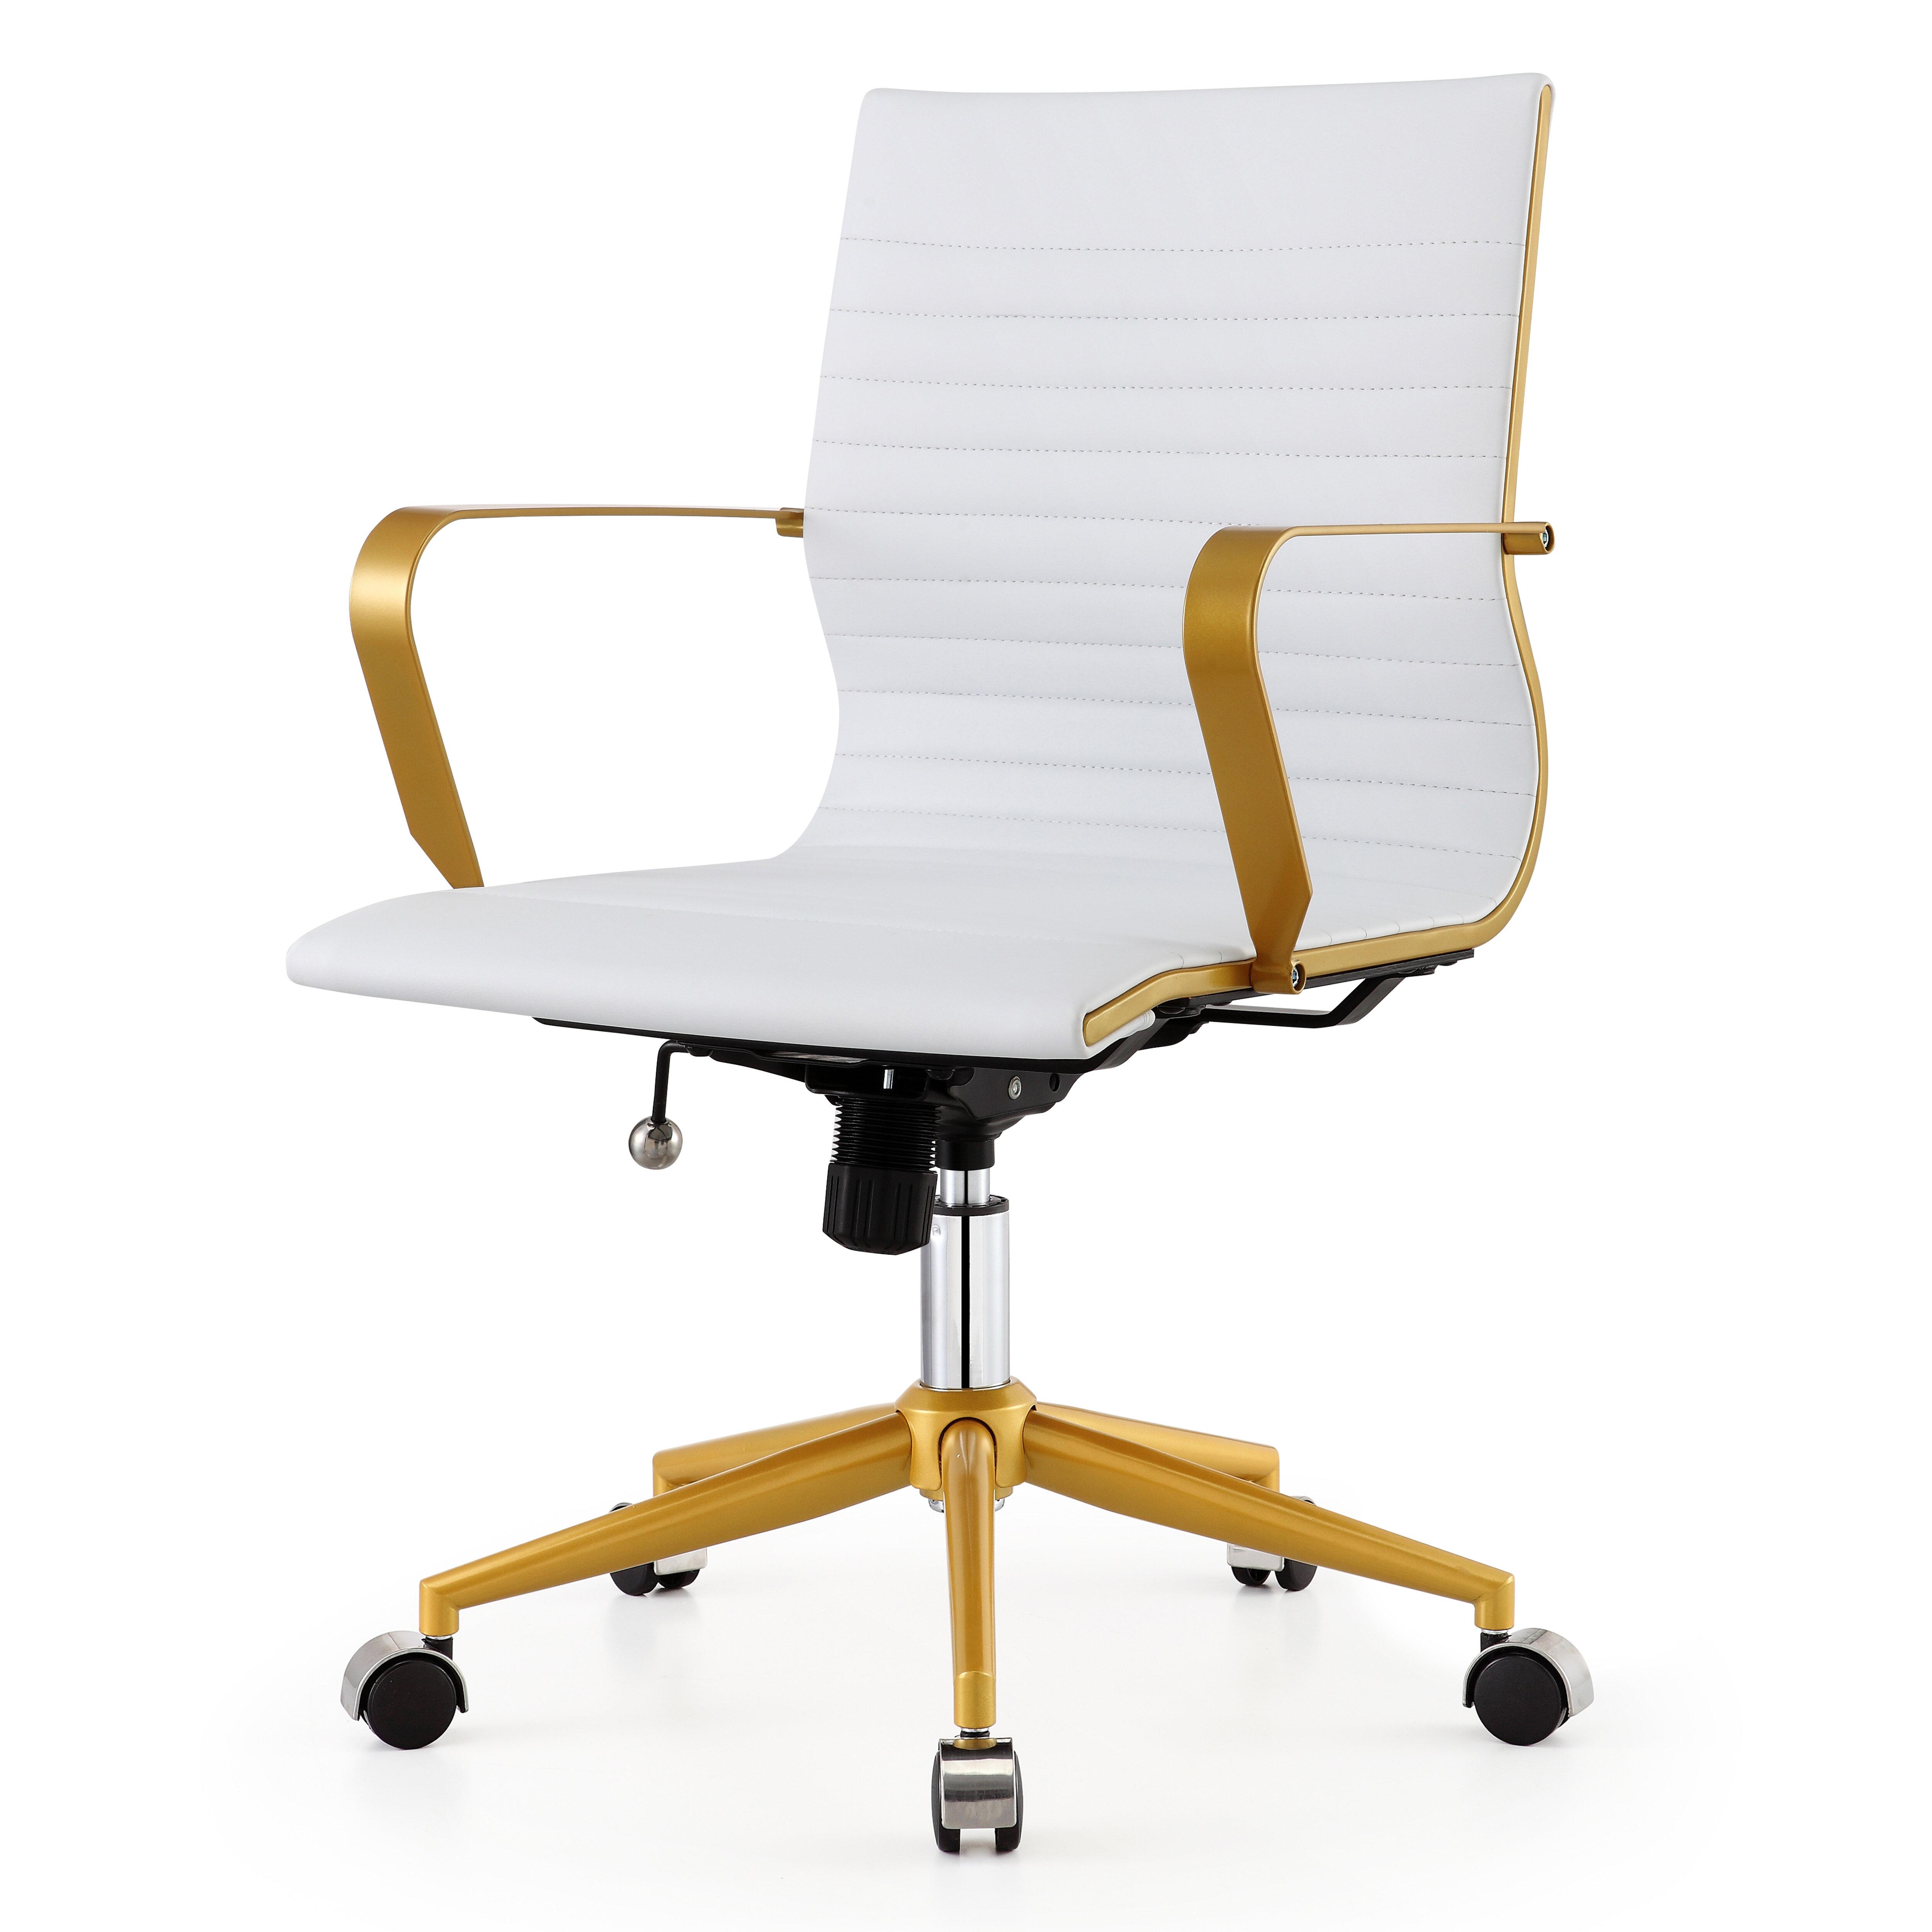 Meelano Mid Back Office Chair U0026 Reviews | Wayfair